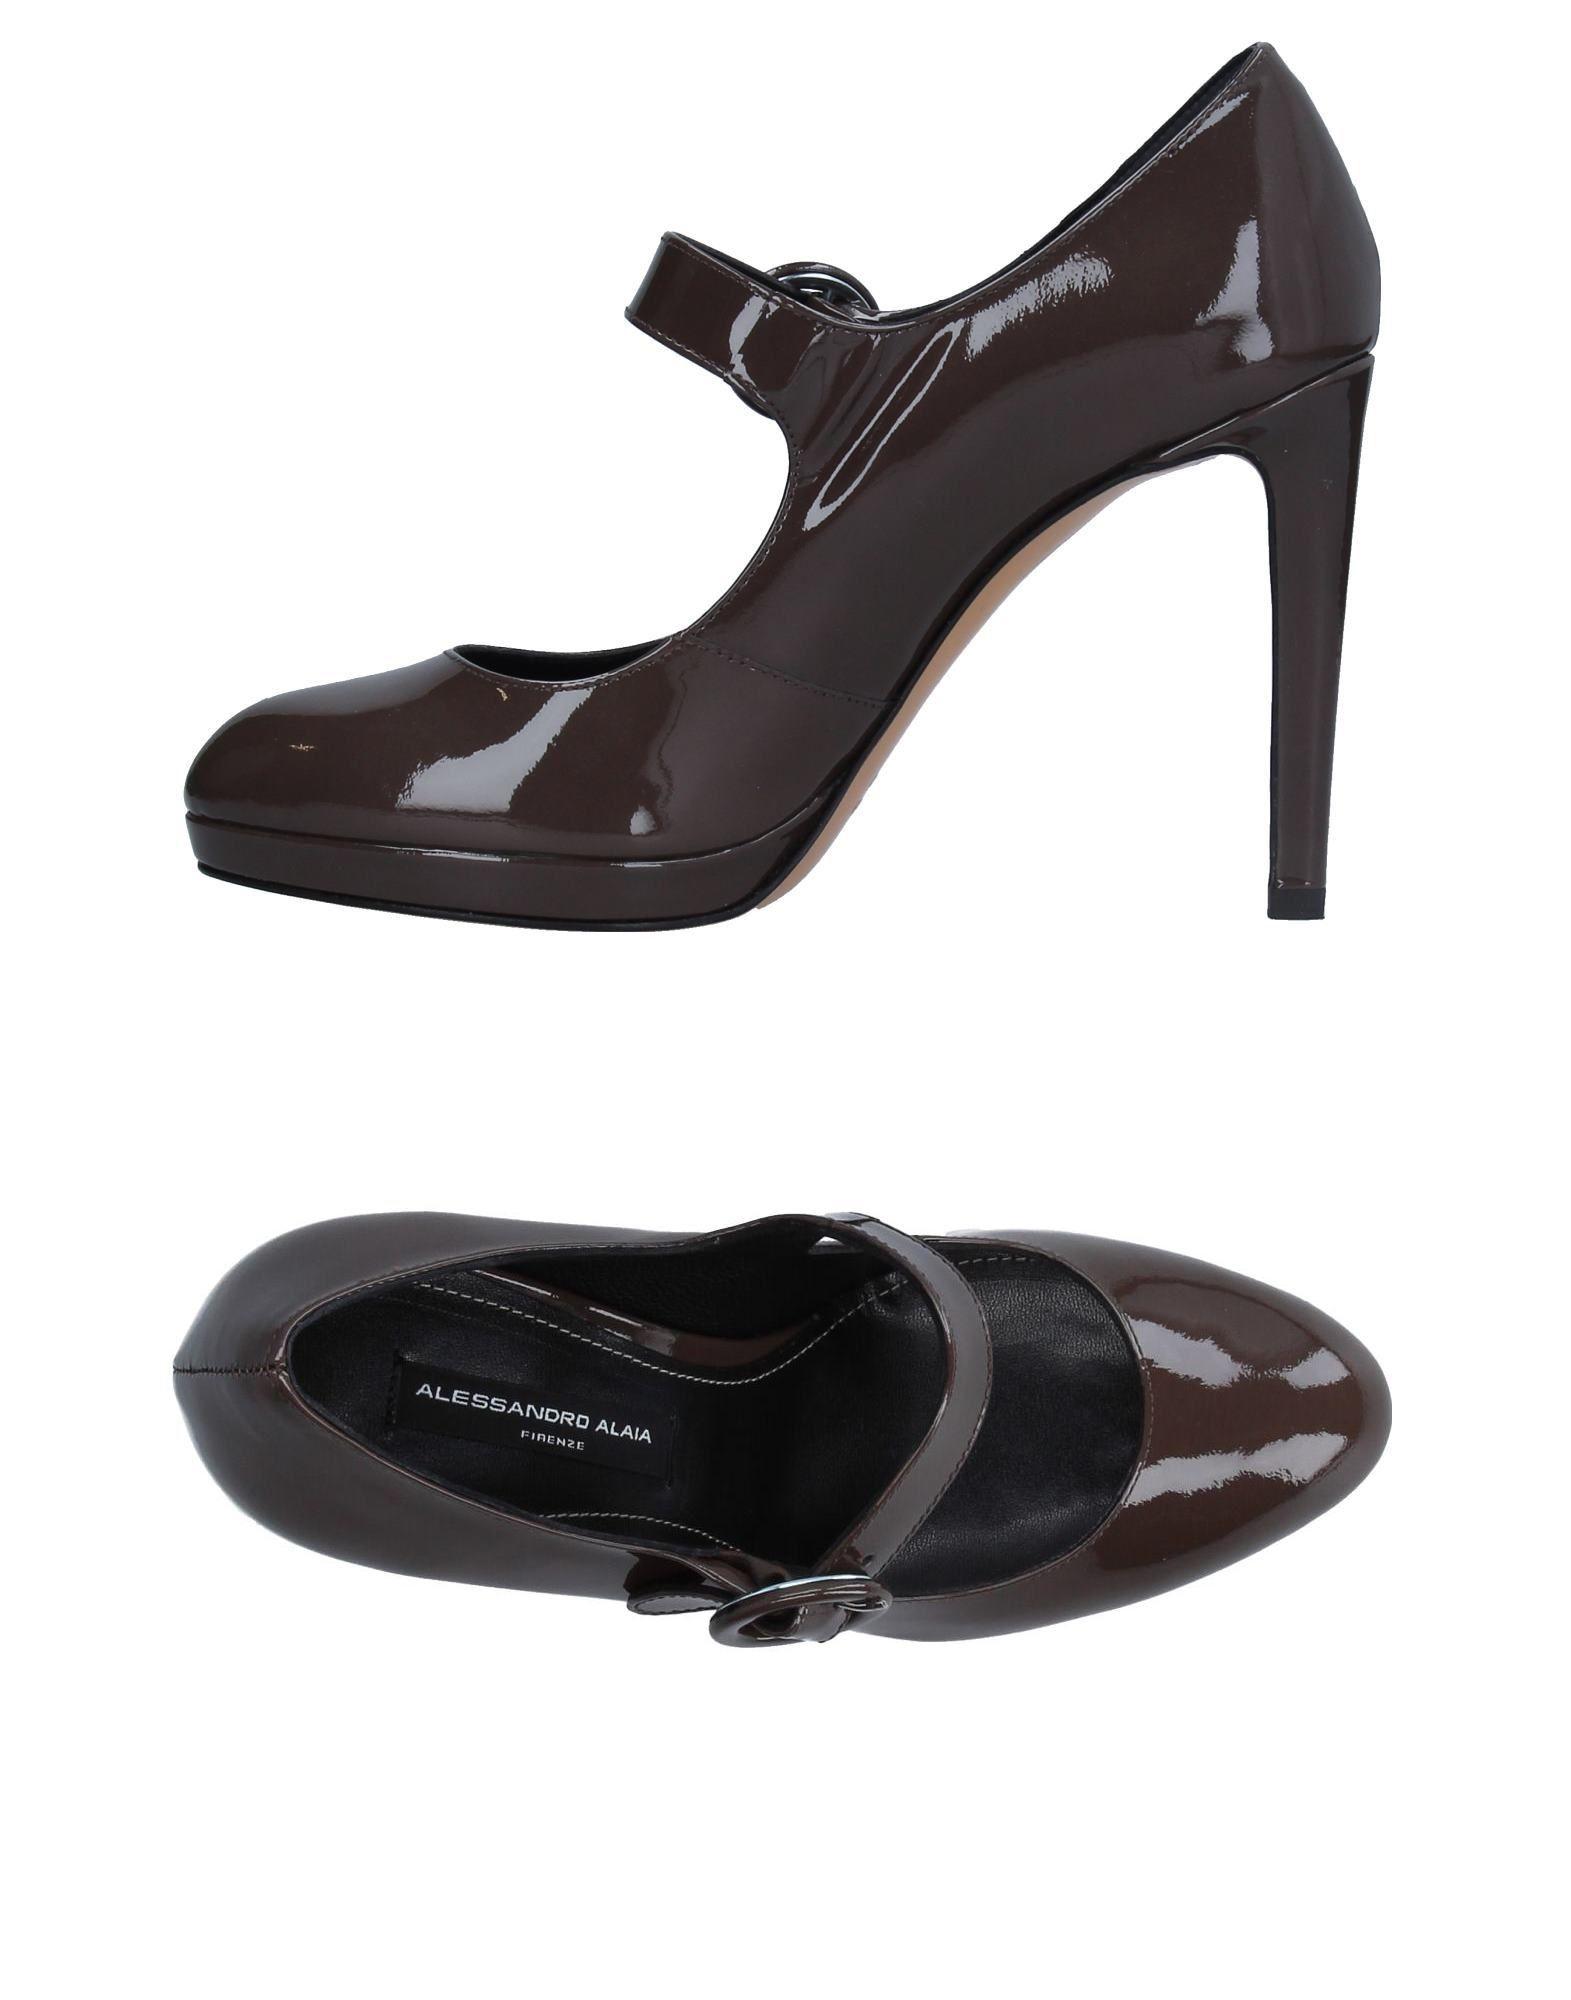 ALESSANDRO ALAIA® Firenze Туфли цены онлайн